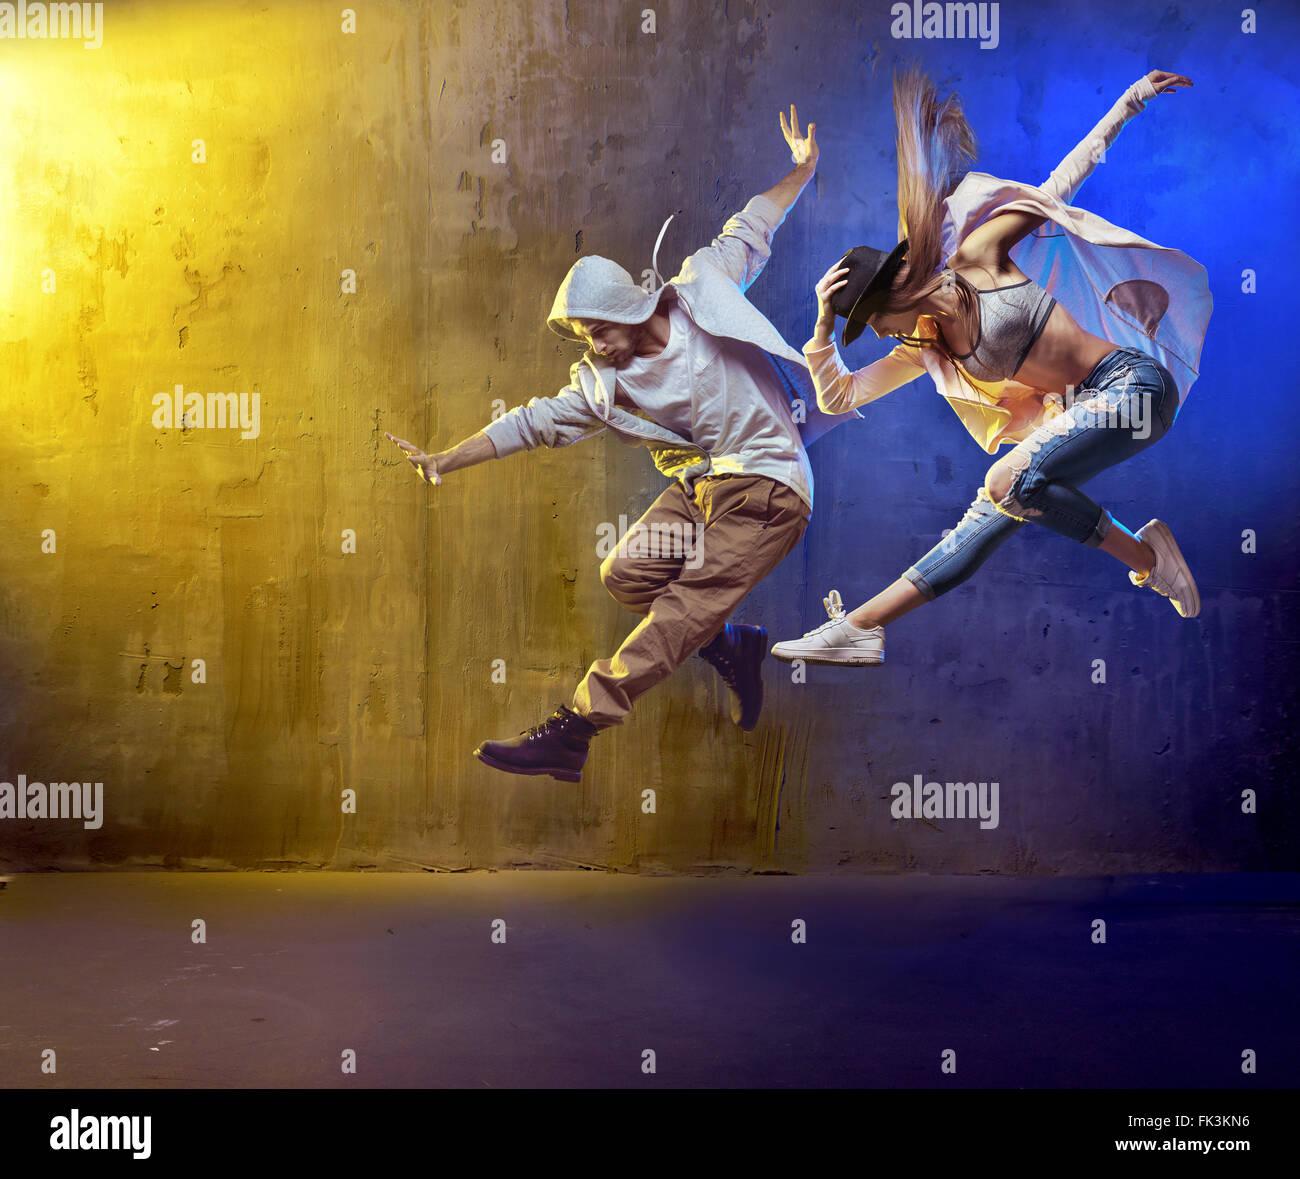 Stilvolle Tänzer tanzen an einem konkreten Ort Stockbild